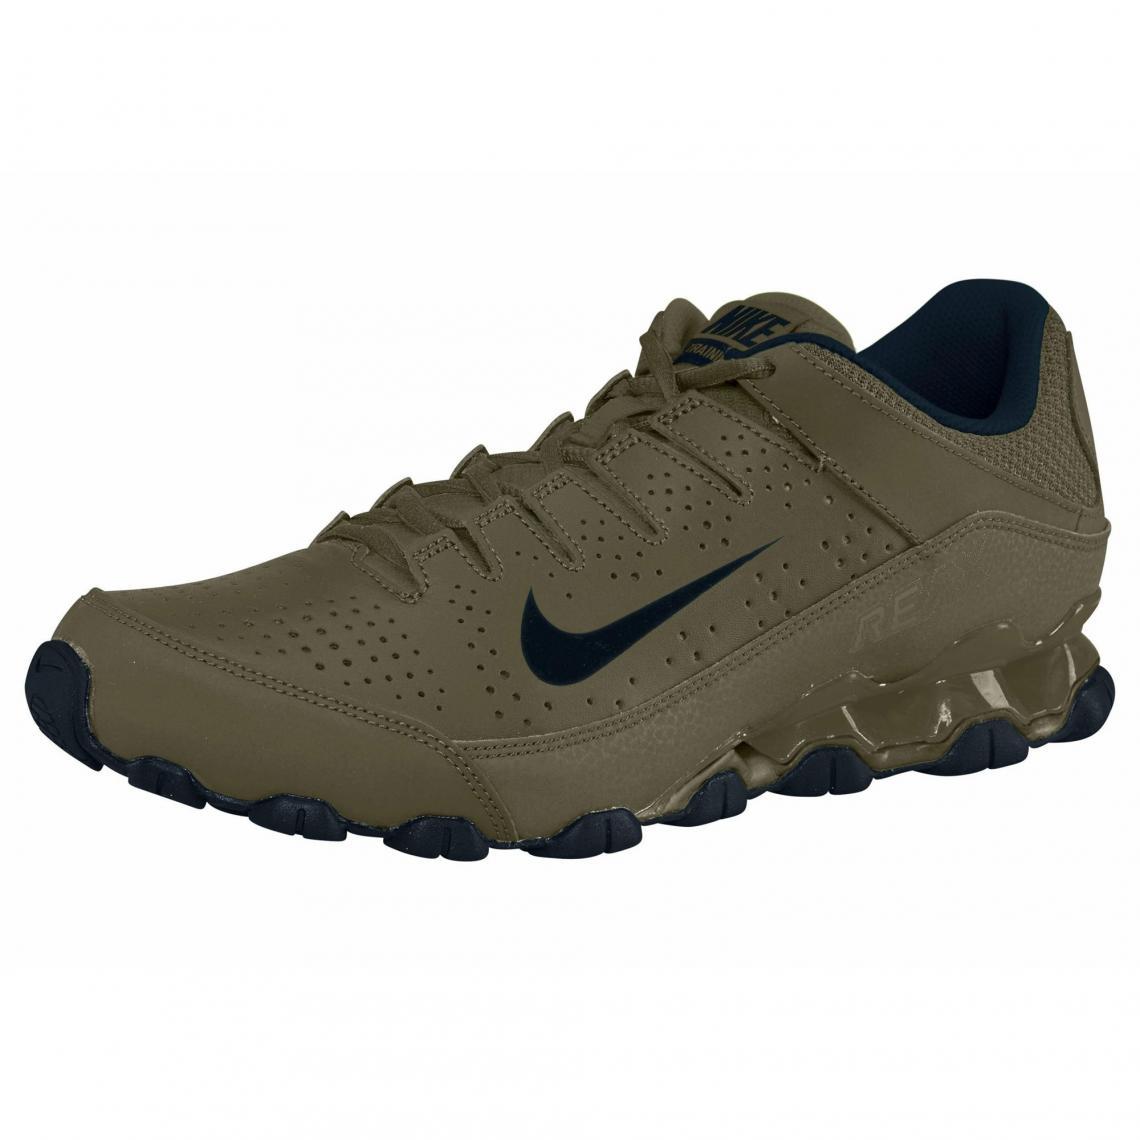 uk availability 4237e 19c7f Nike Reax 8 Tr chaussures de running homme - Kaki Nike Homme